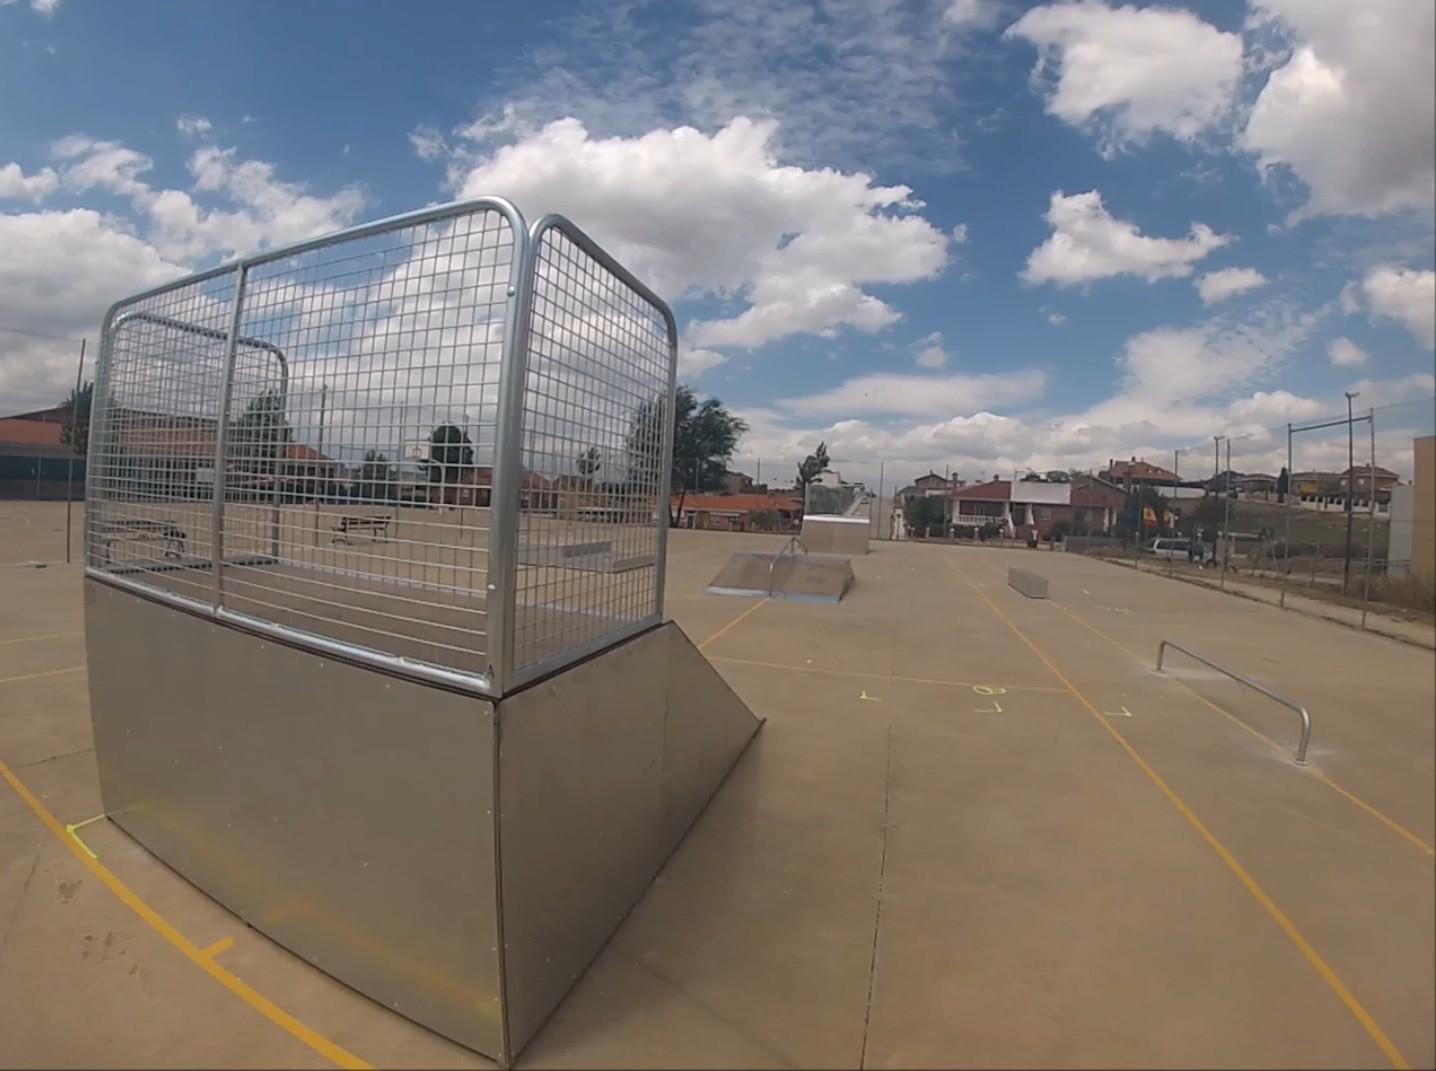 Bikeparks modulares por NV Sports